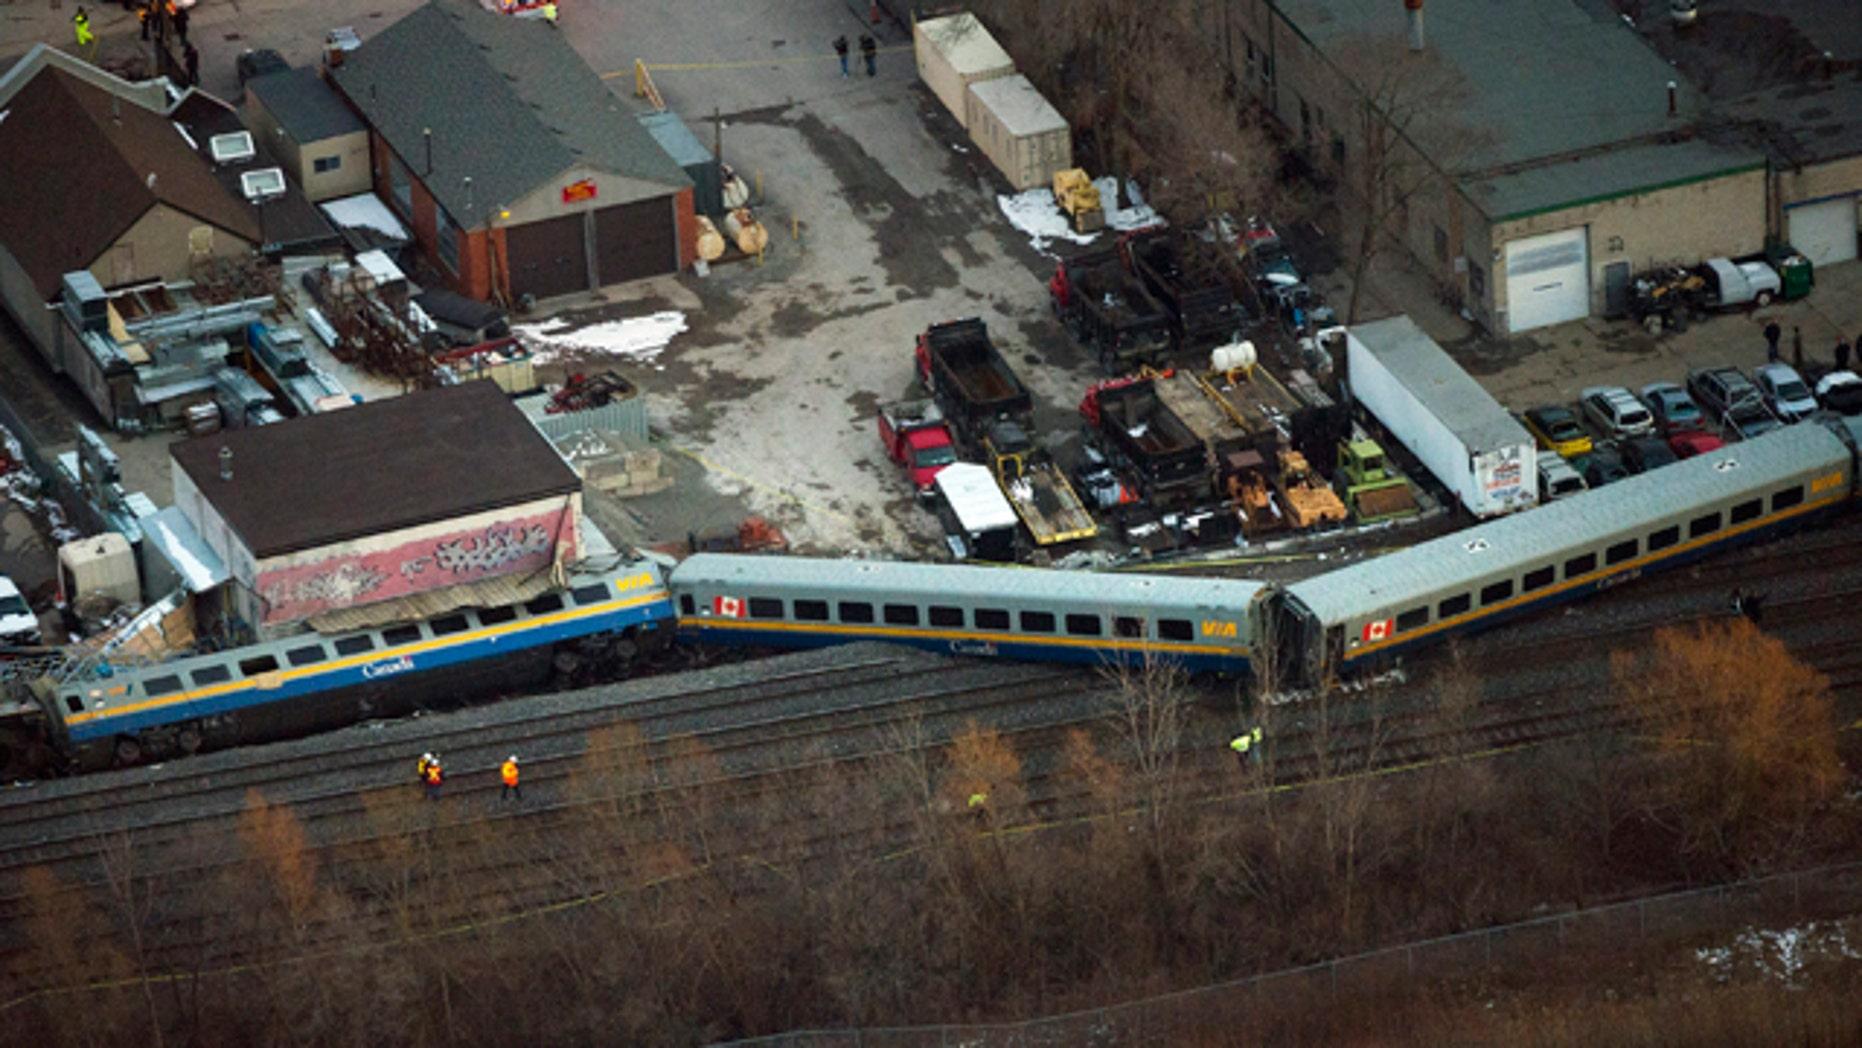 Feb. 26, 2012: Emergency crews work the scene of a Via Rail train derailment in Burlington, Ontario, west of Toronto.